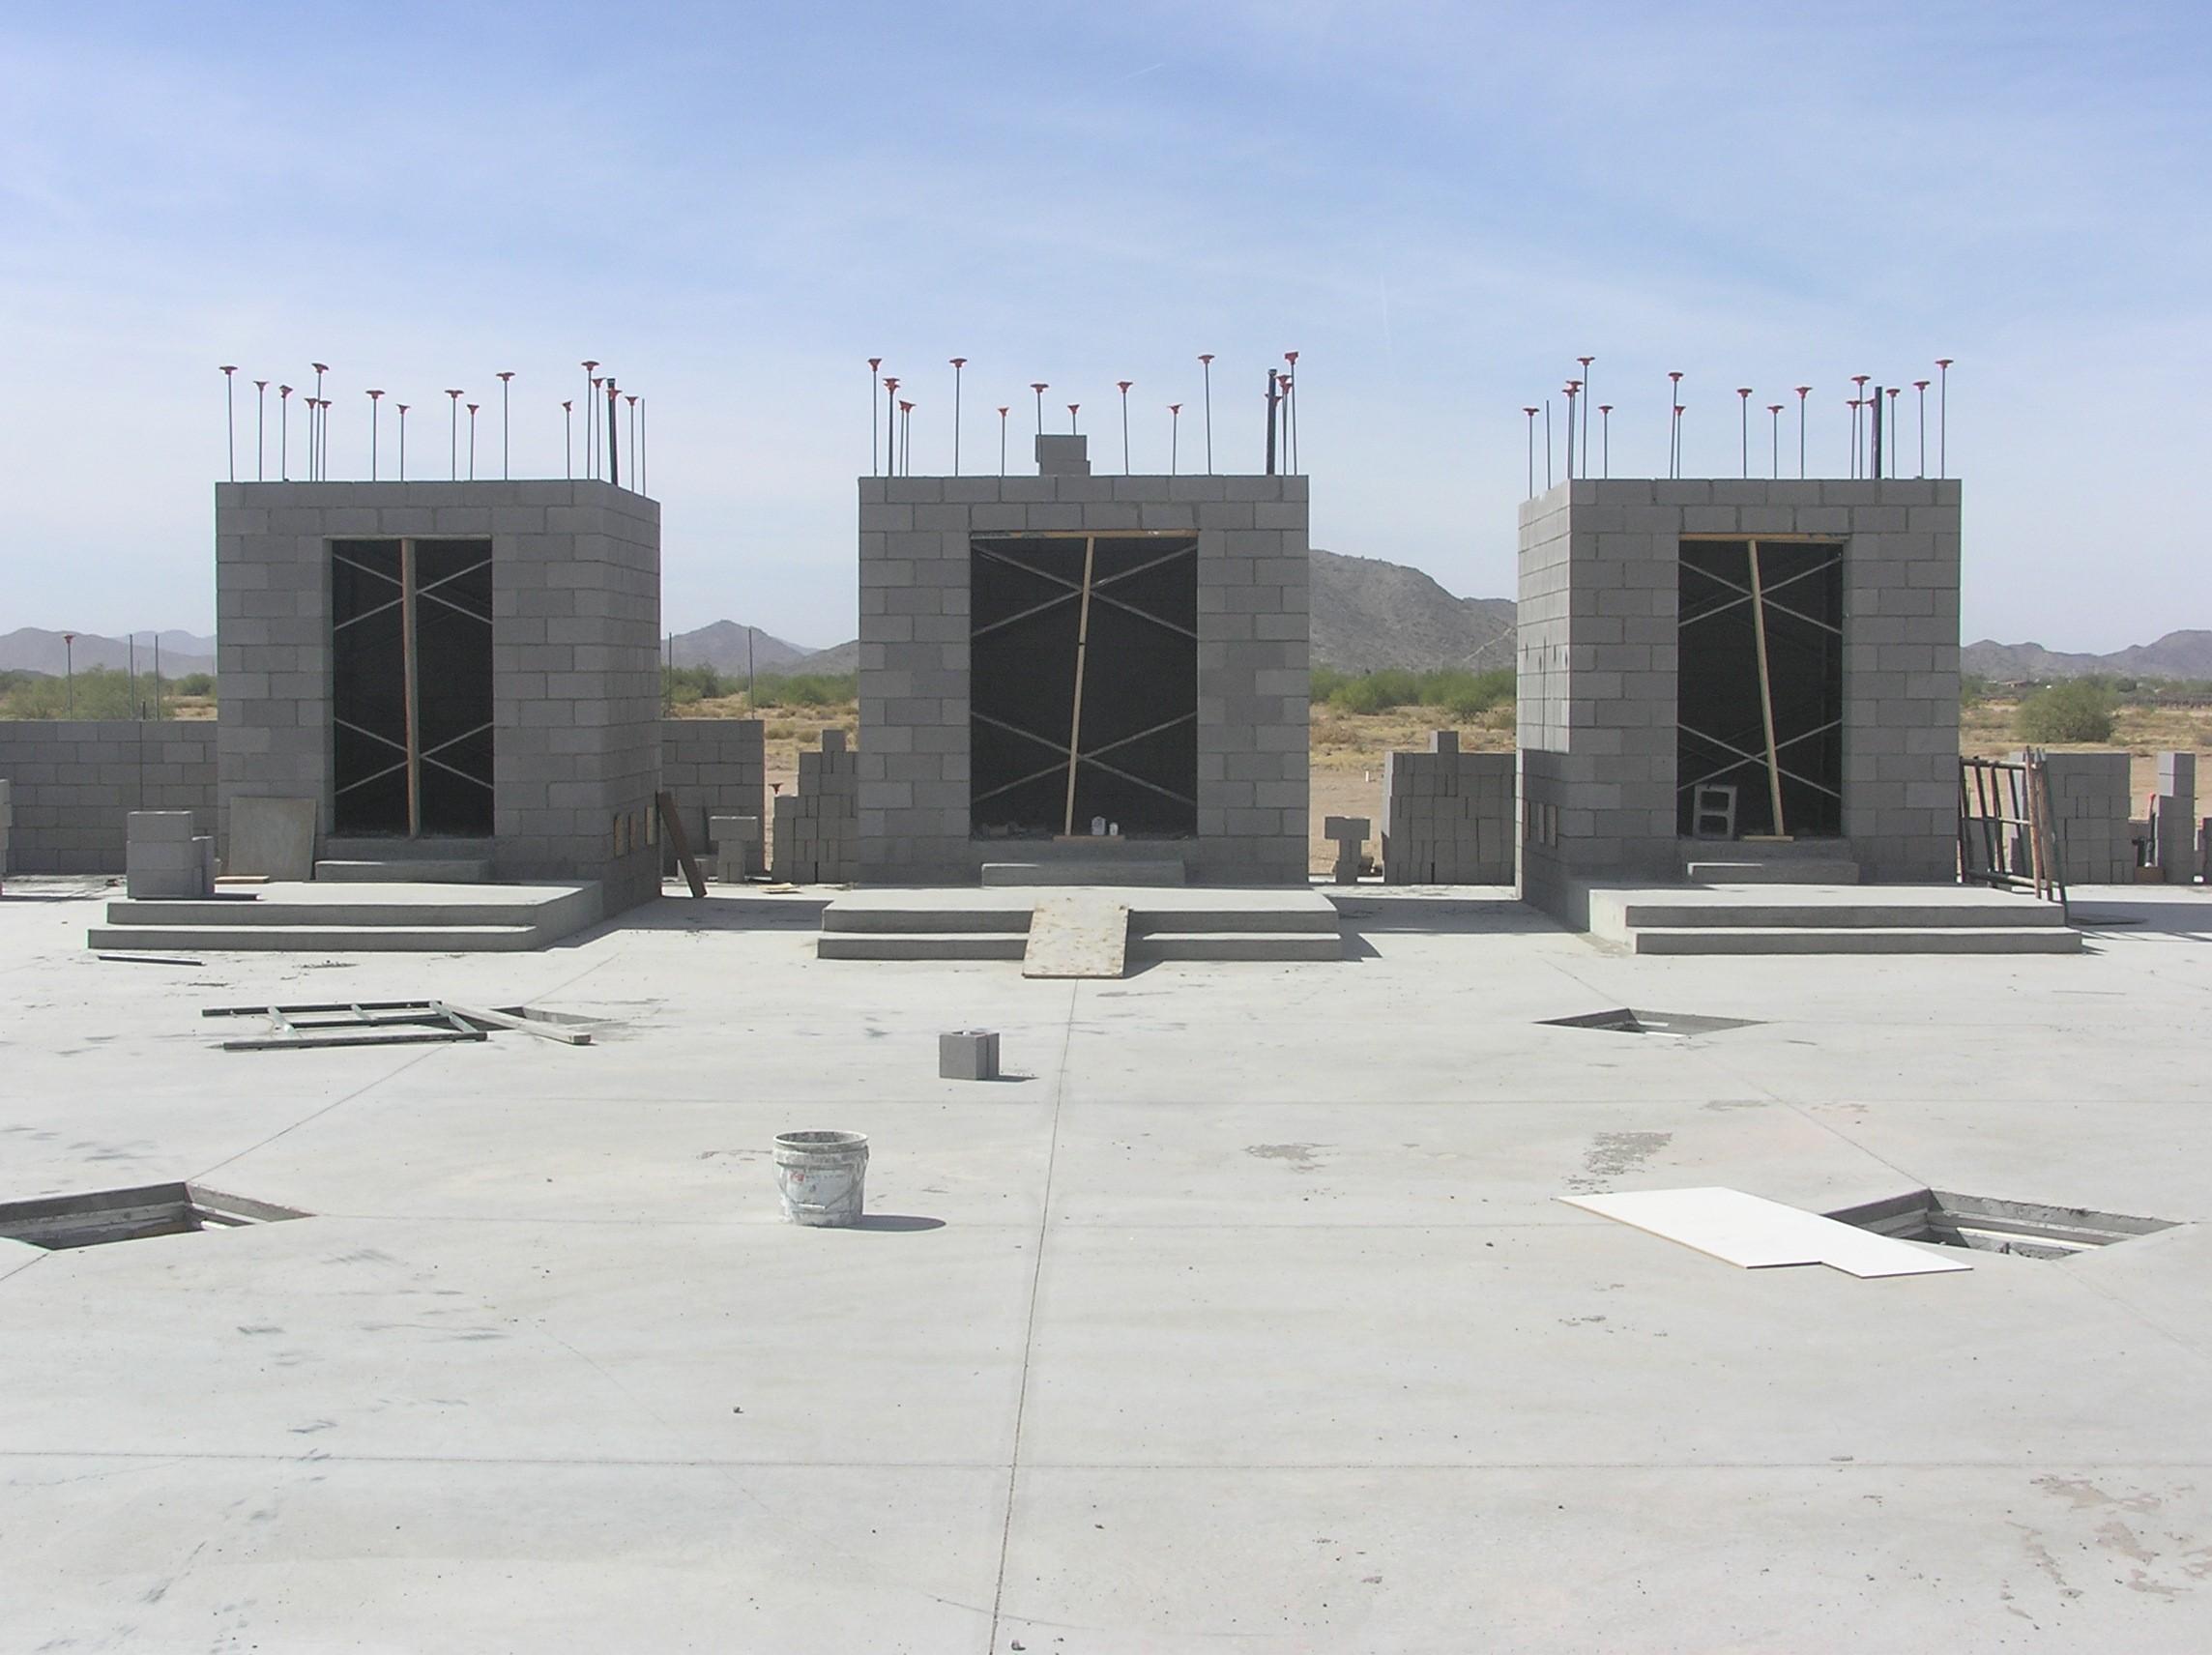 Main Shrines Under Construction (2008)